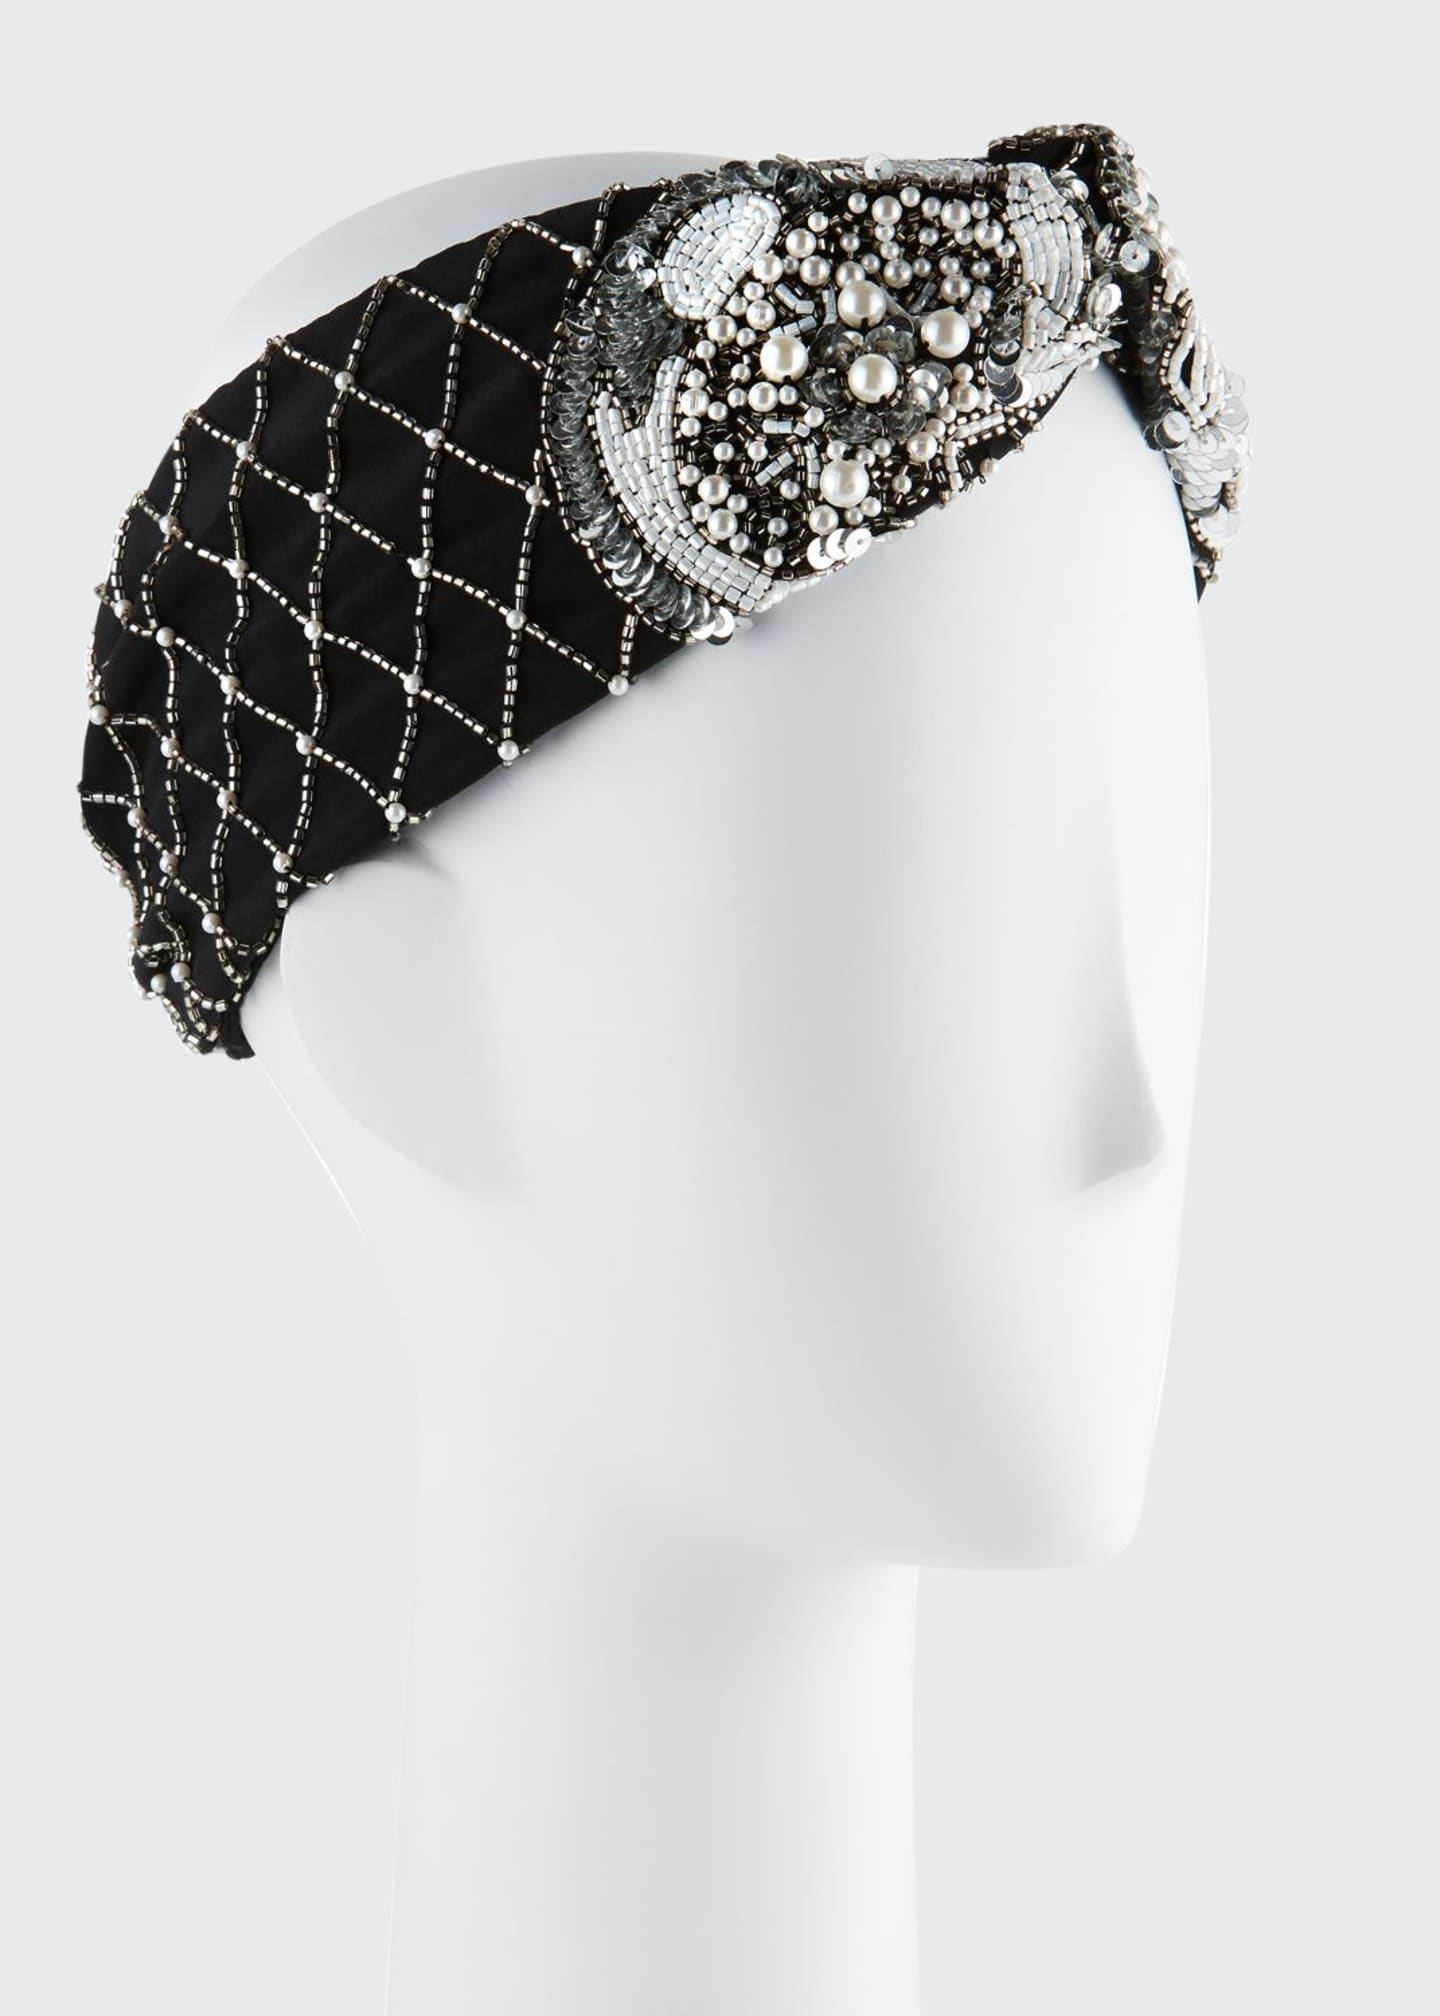 Mignonne Gavigan Le Charlot Beaded Turban Headband